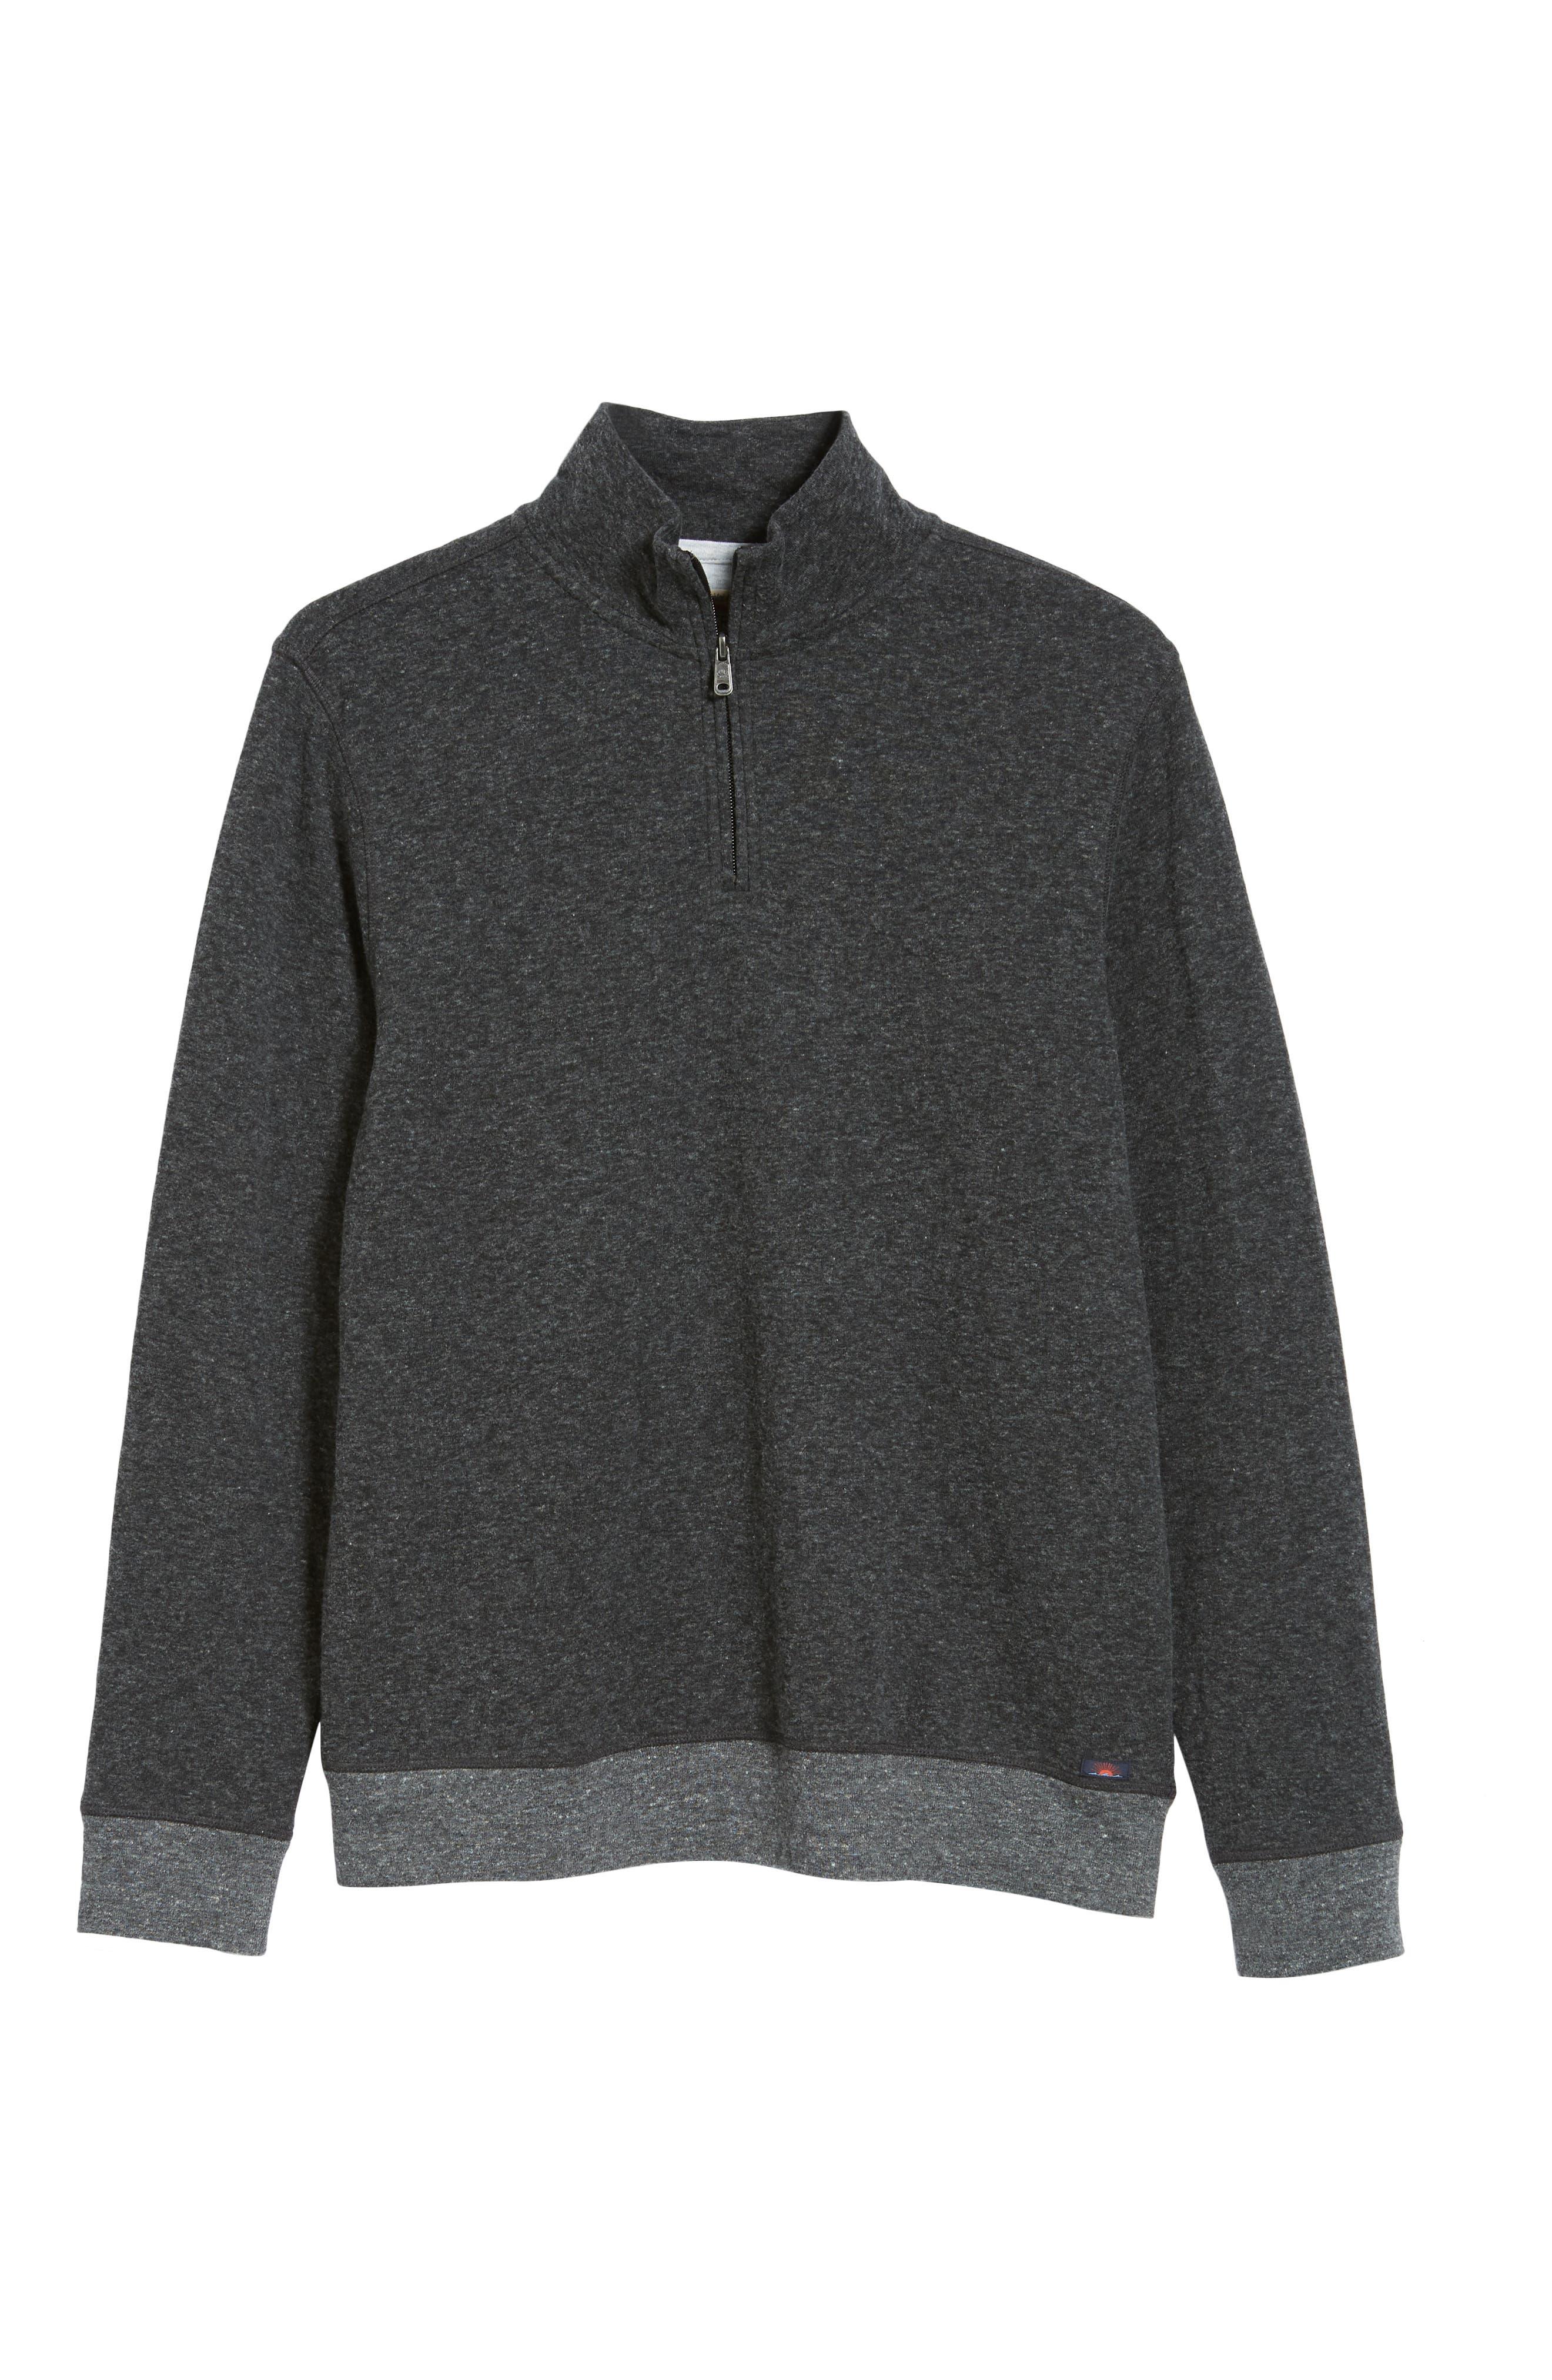 Dual Knit Regular Fit Quarter Zip Pullover,                             Alternate thumbnail 6, color,                             WASHED BLACK